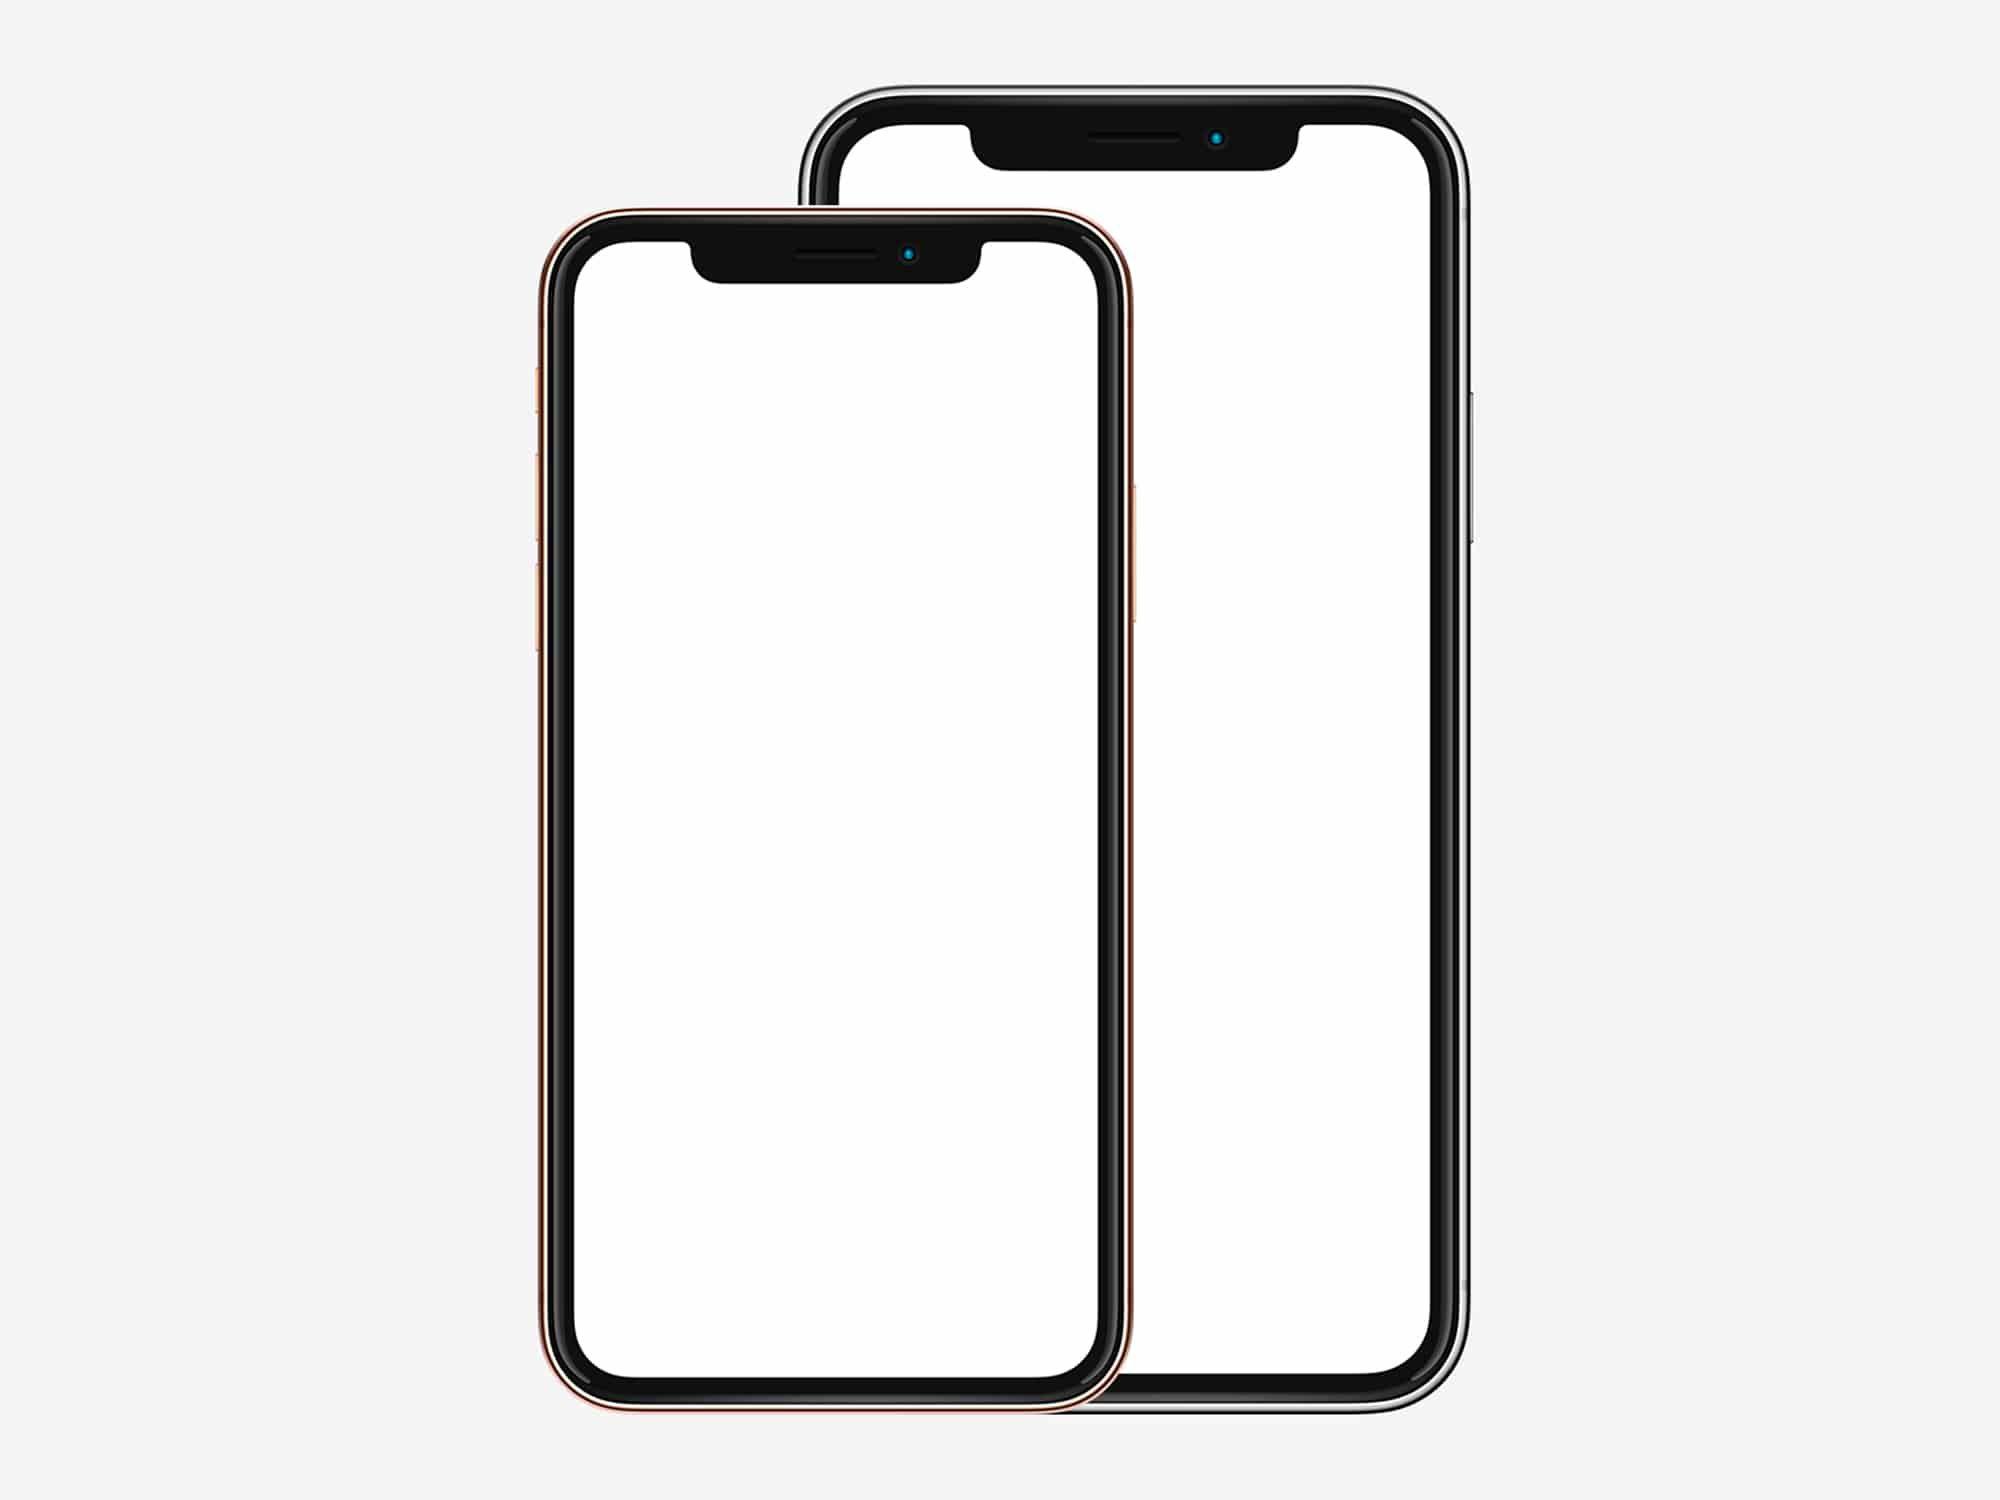 Iphone xs mockup free